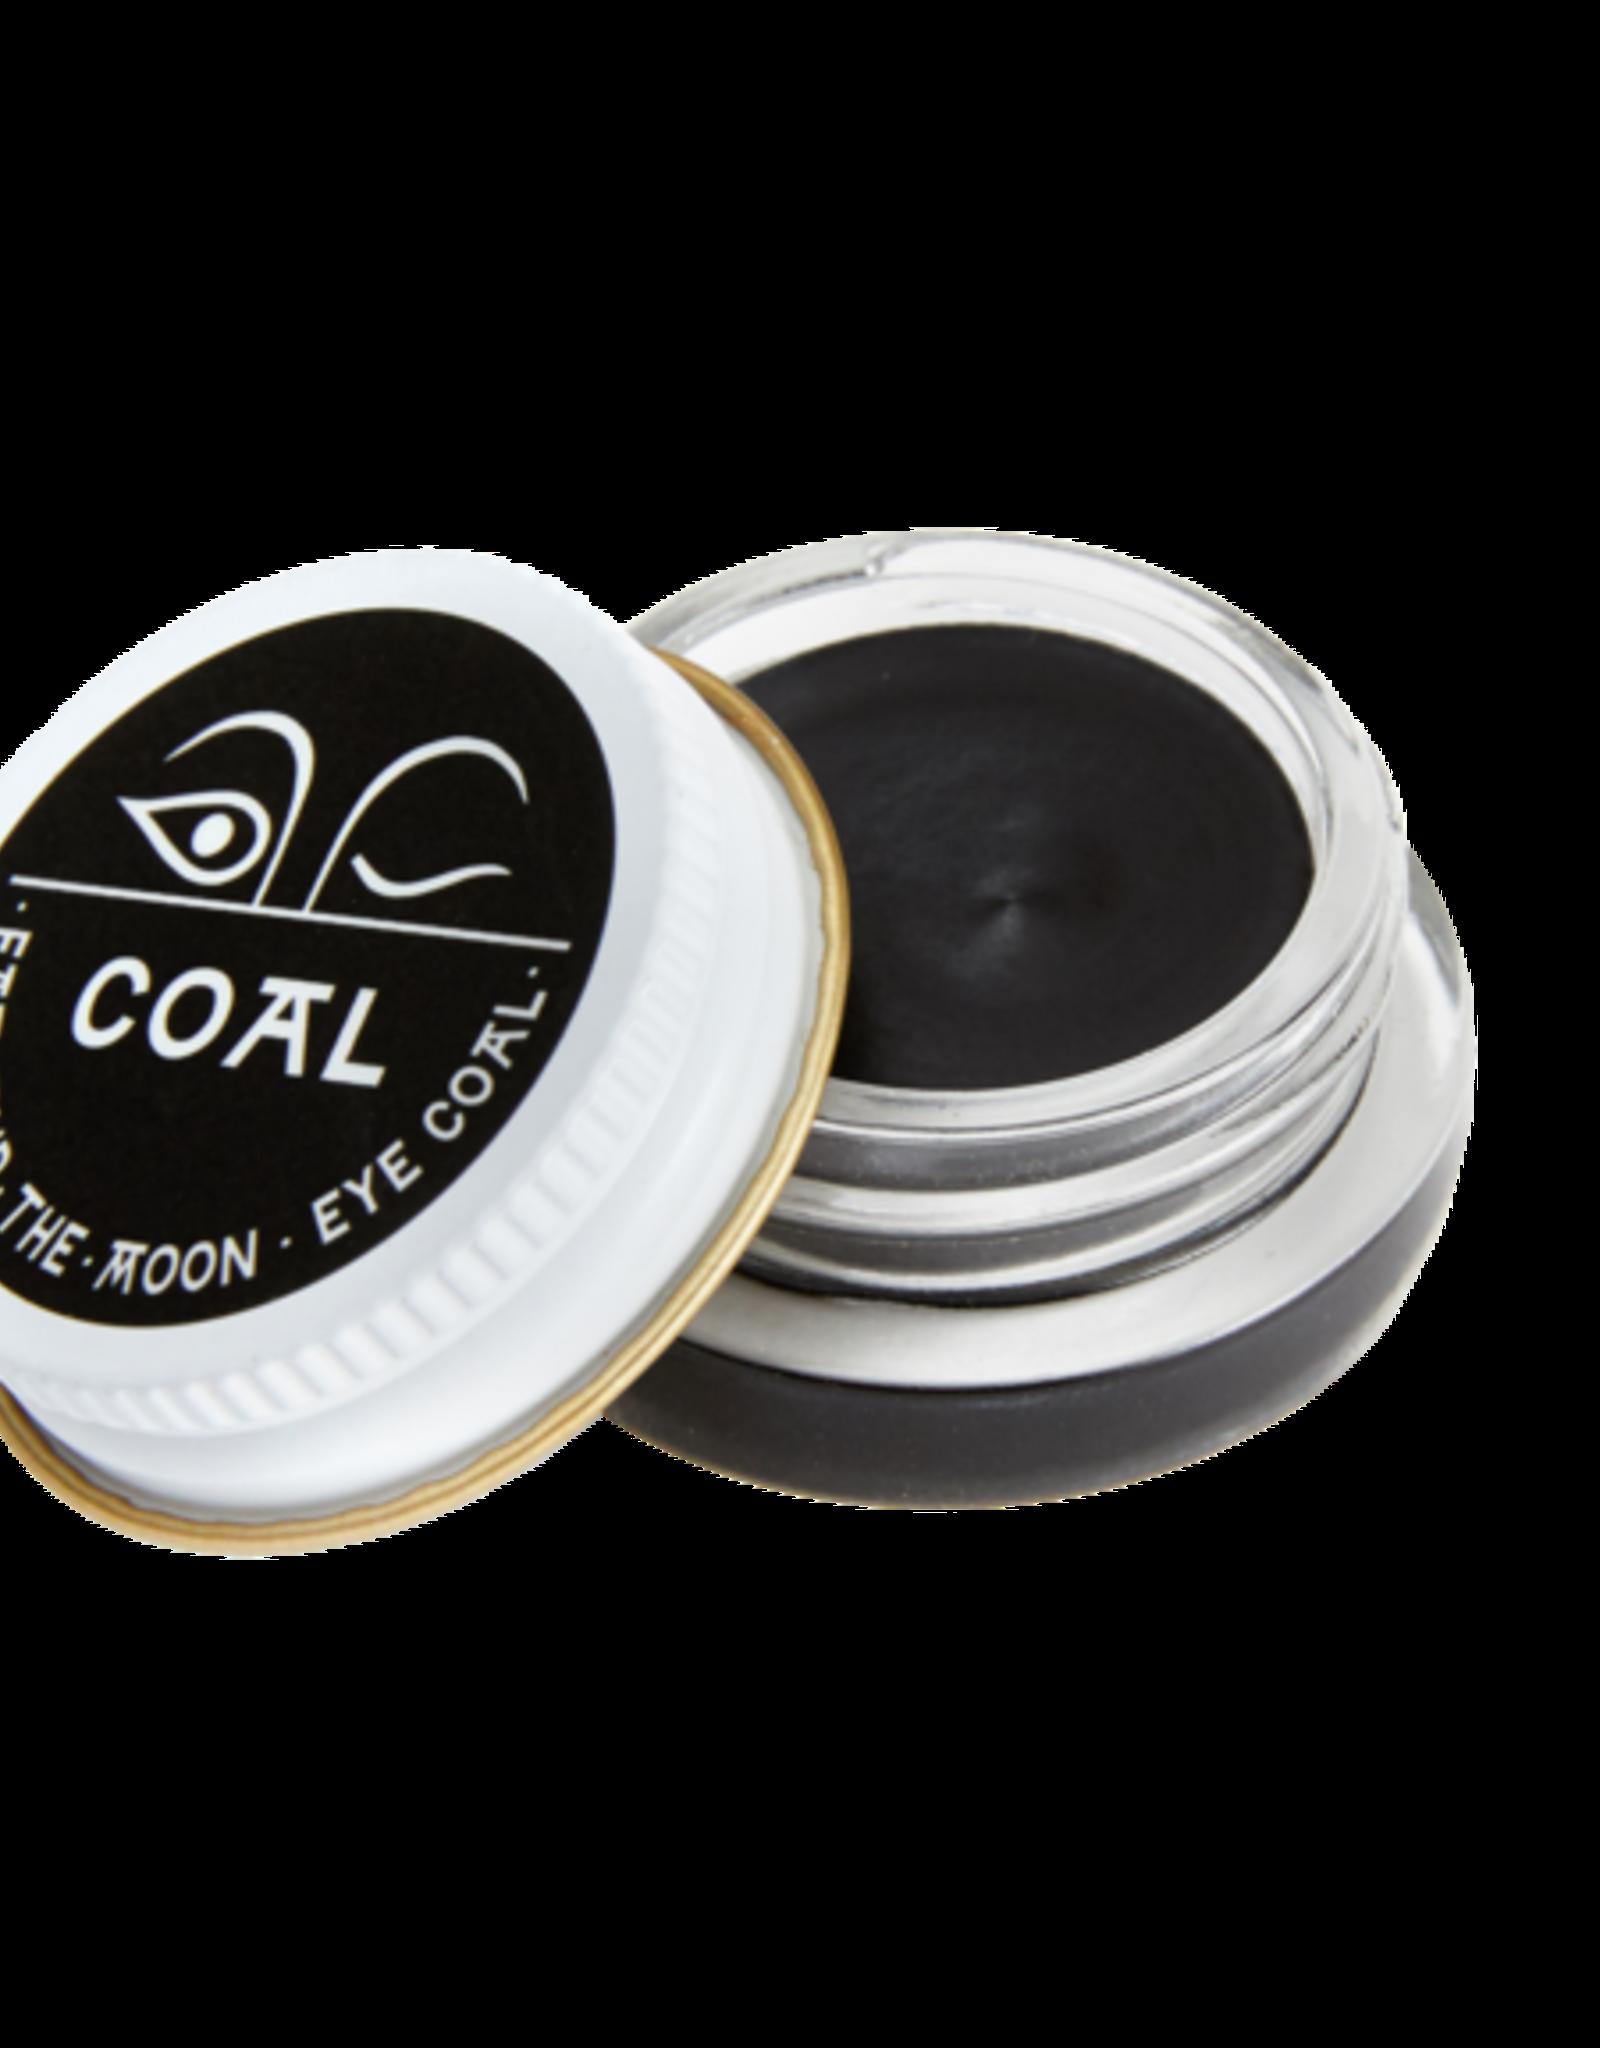 Fat and Moon Eye Coal